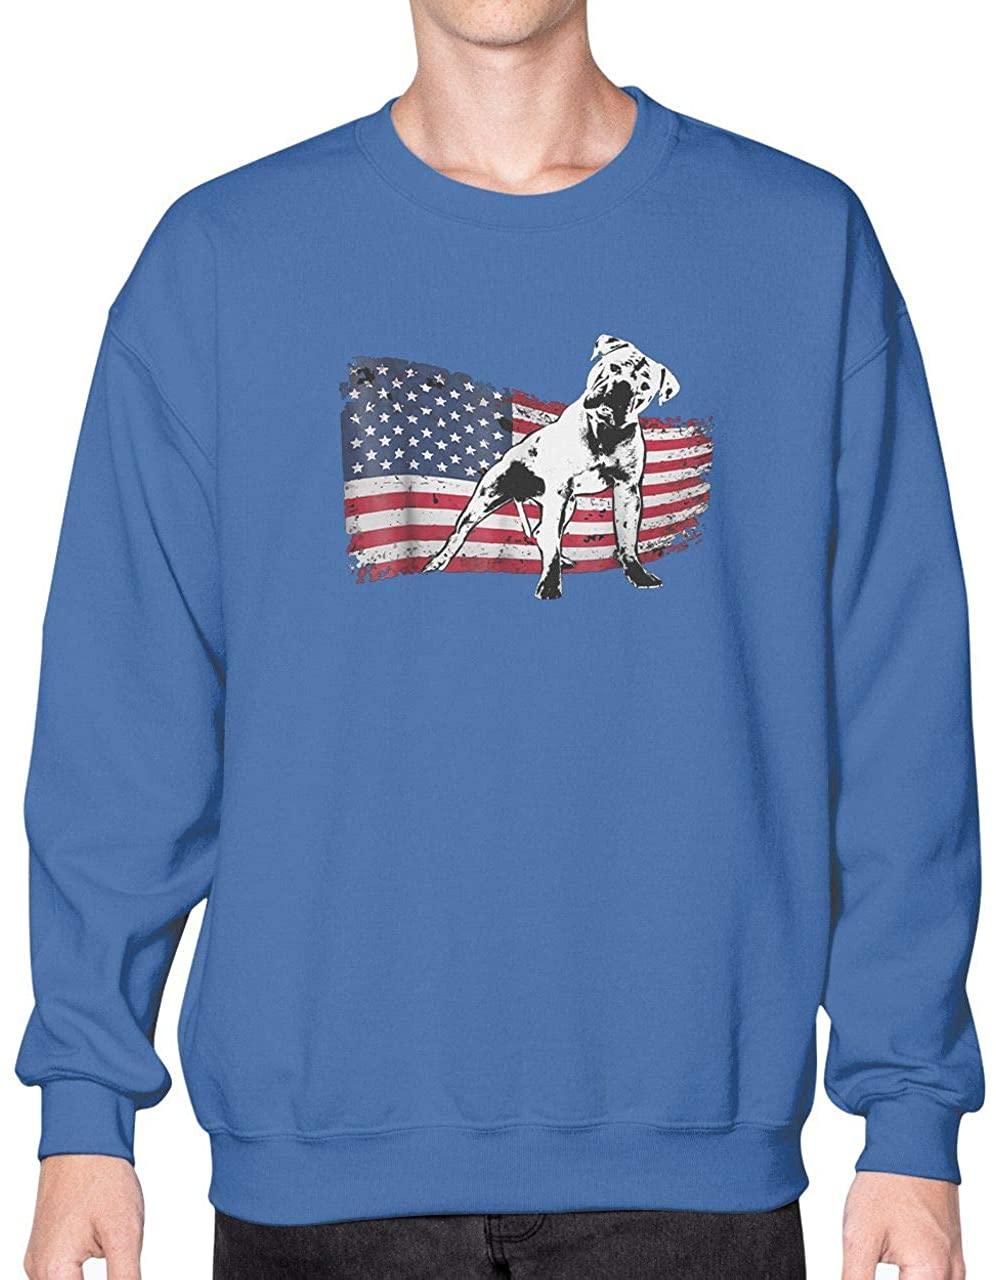 Nultat Check-Out American-Bulldog-Fun-Dog-Shirt